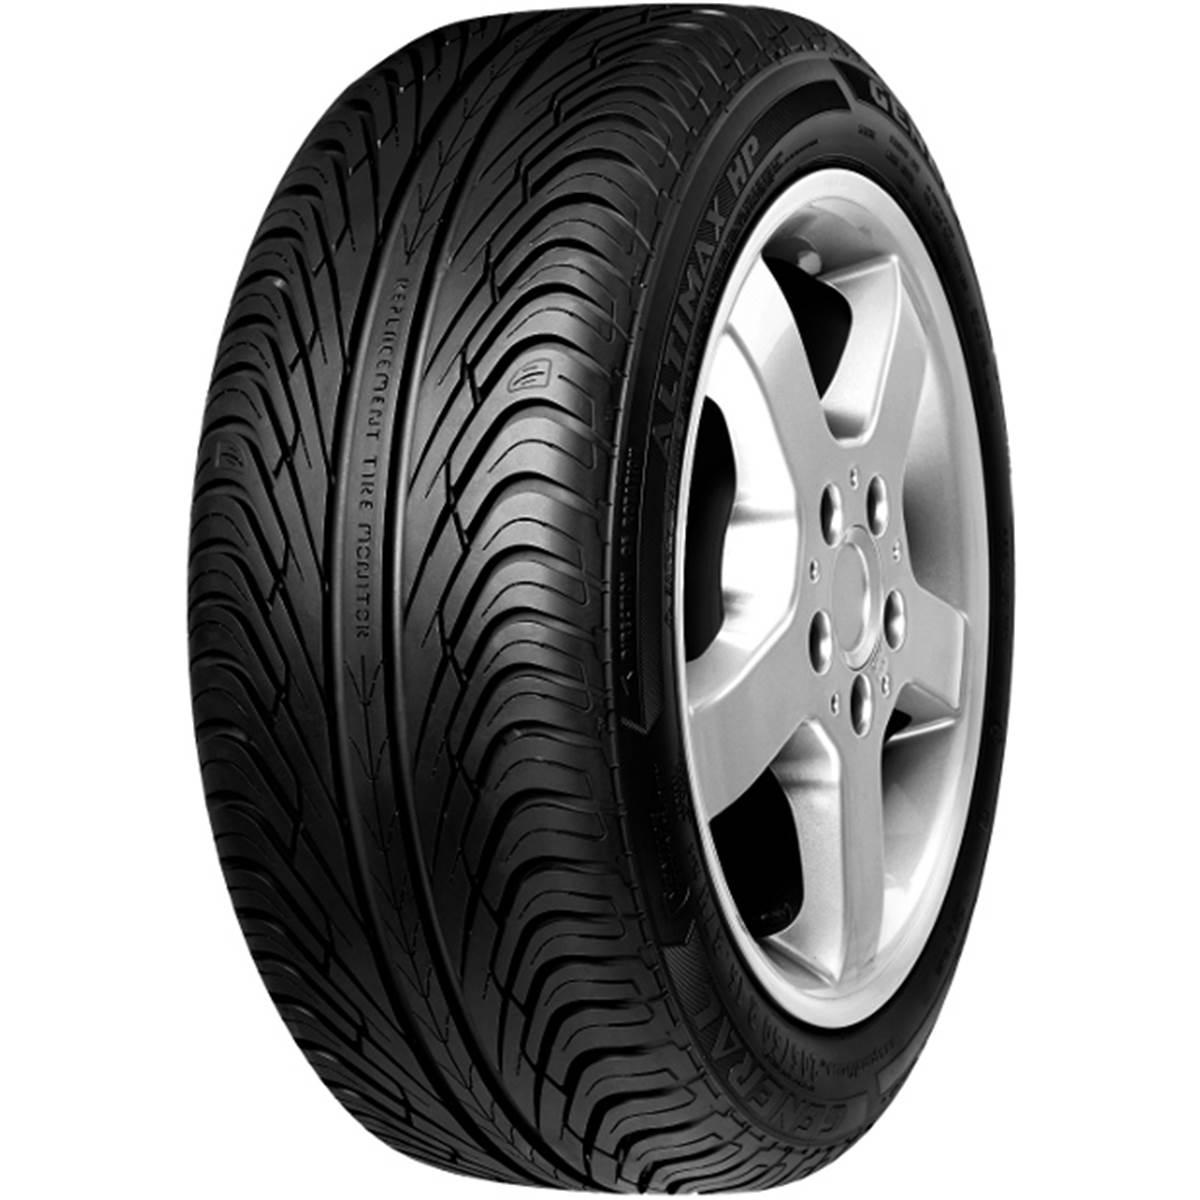 pneu general altimax hp moins cher sur pneu pas cher. Black Bedroom Furniture Sets. Home Design Ideas